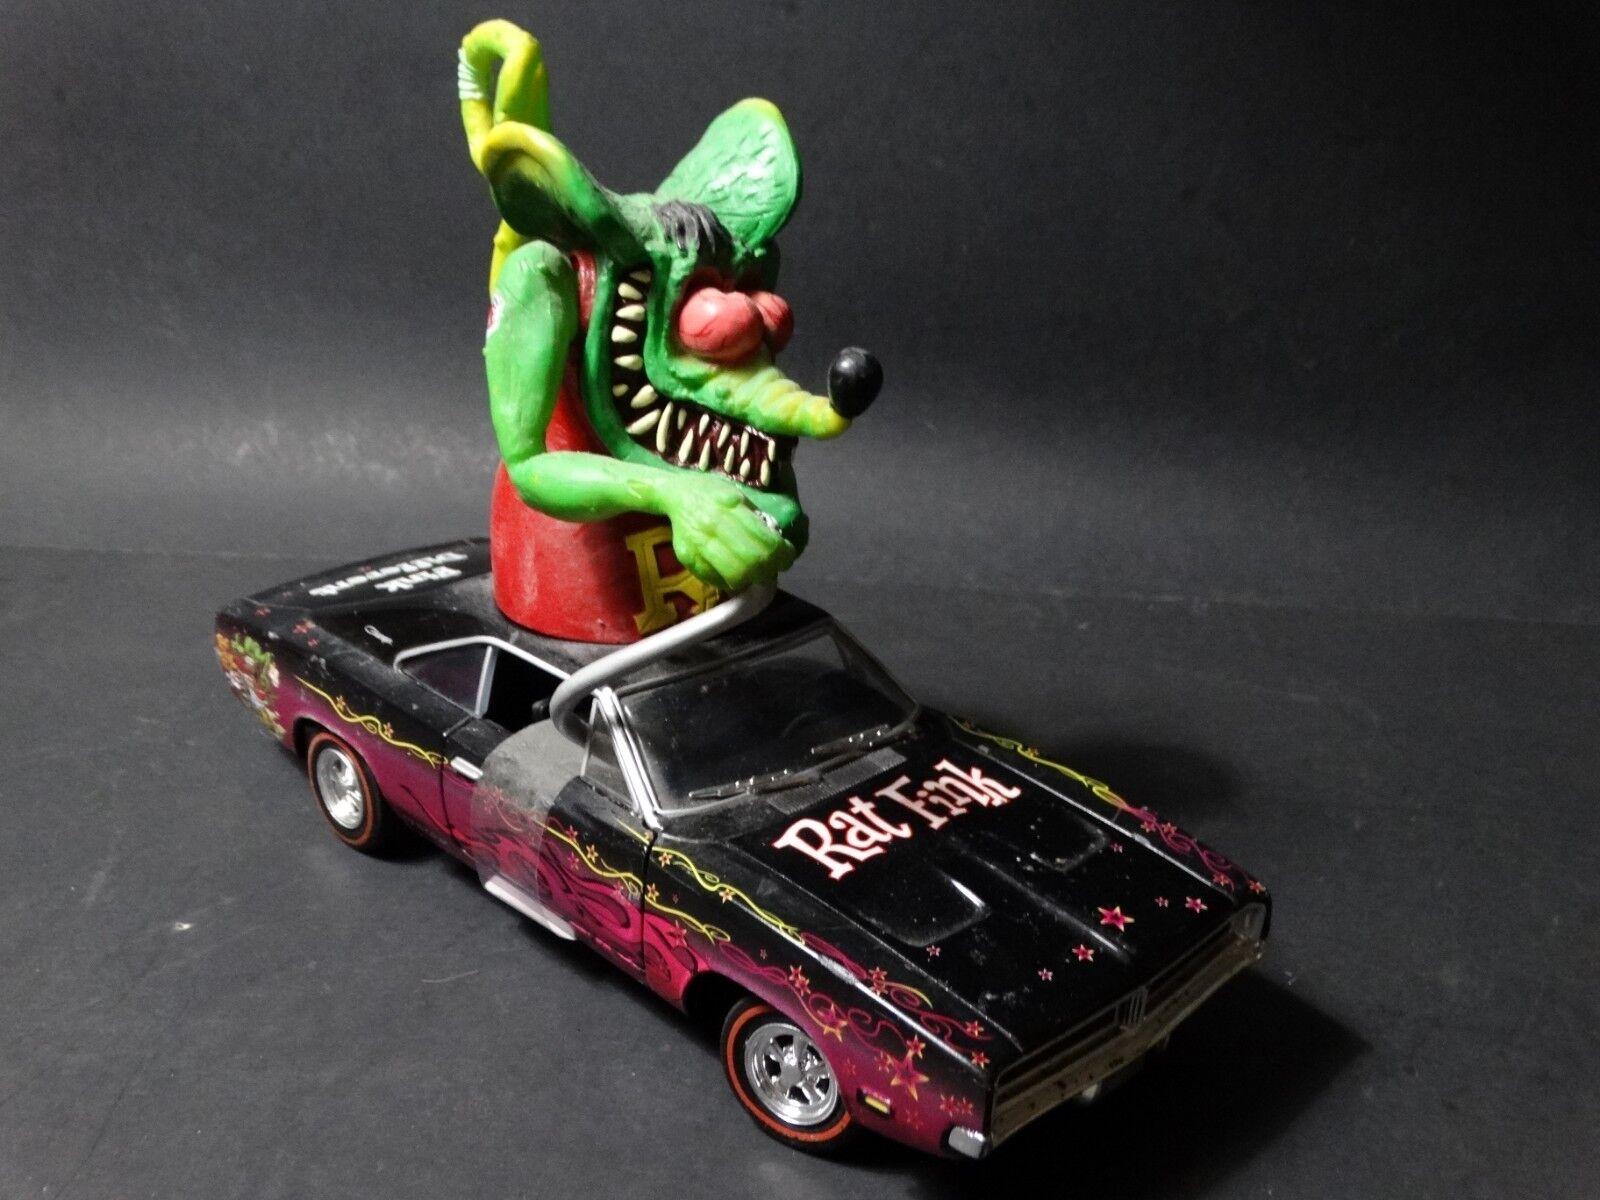 Johnny Lightning 1969 Dodge Chargeur Rat Fink MATCO TOOLS échelle 1 24 Diecast Voiture